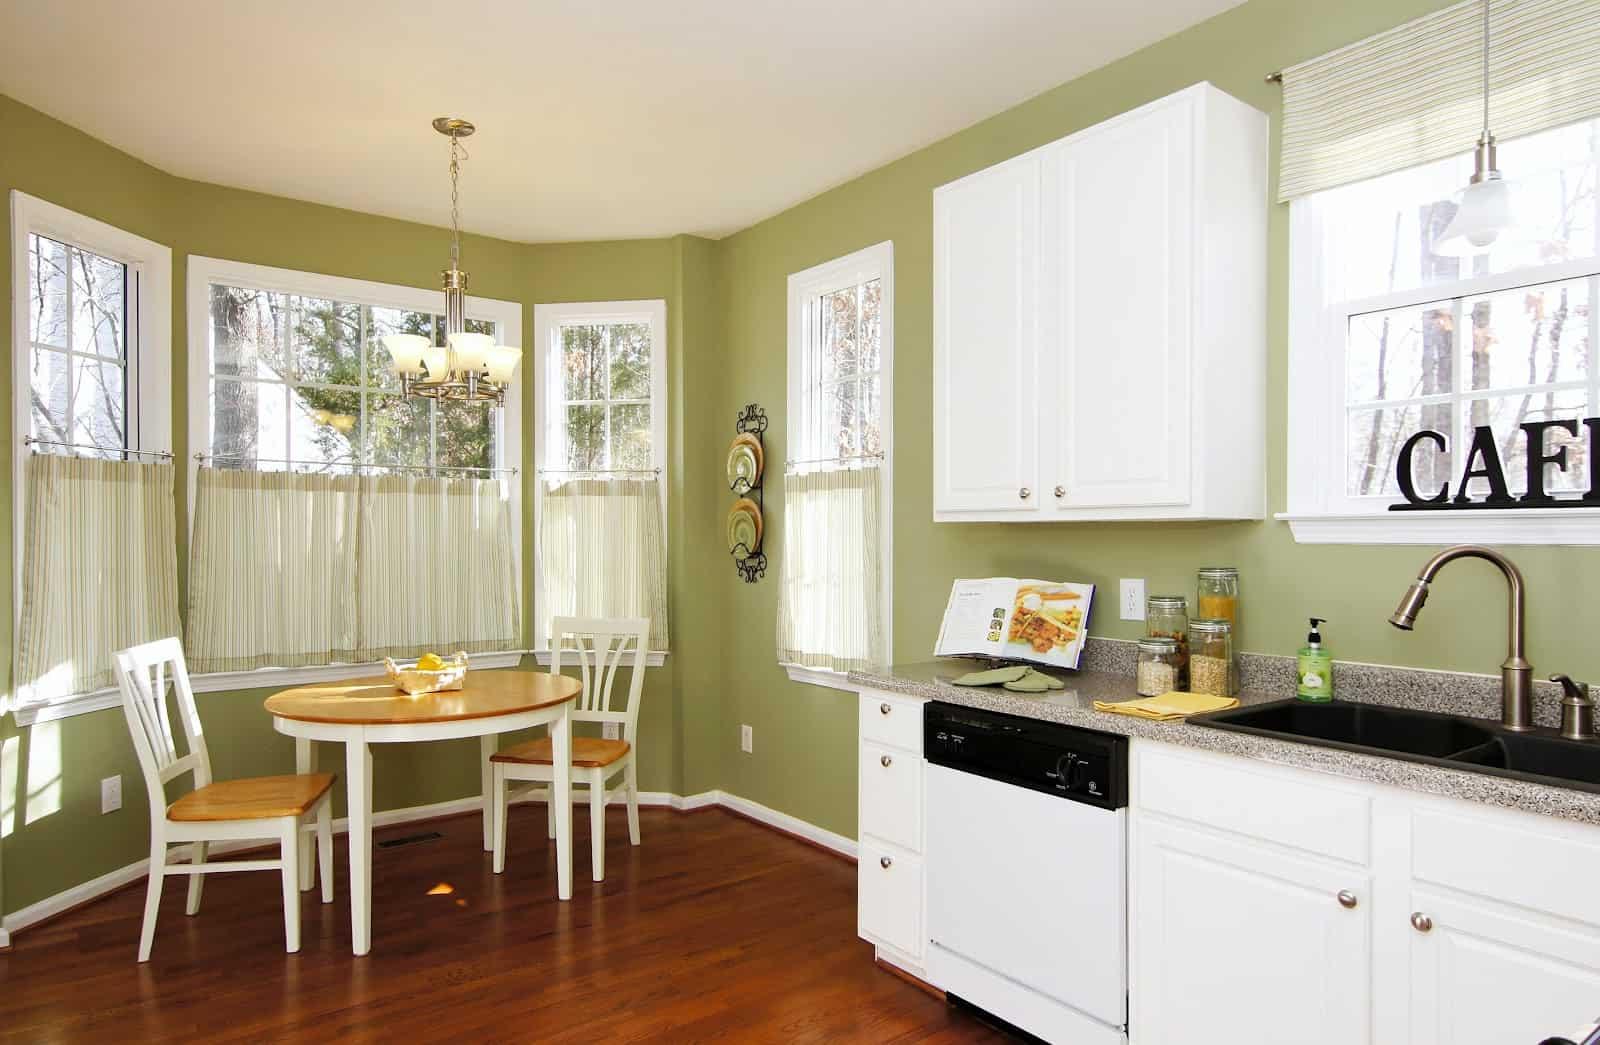 kitchen nook curtains ikea islands trendy breakfast ideas